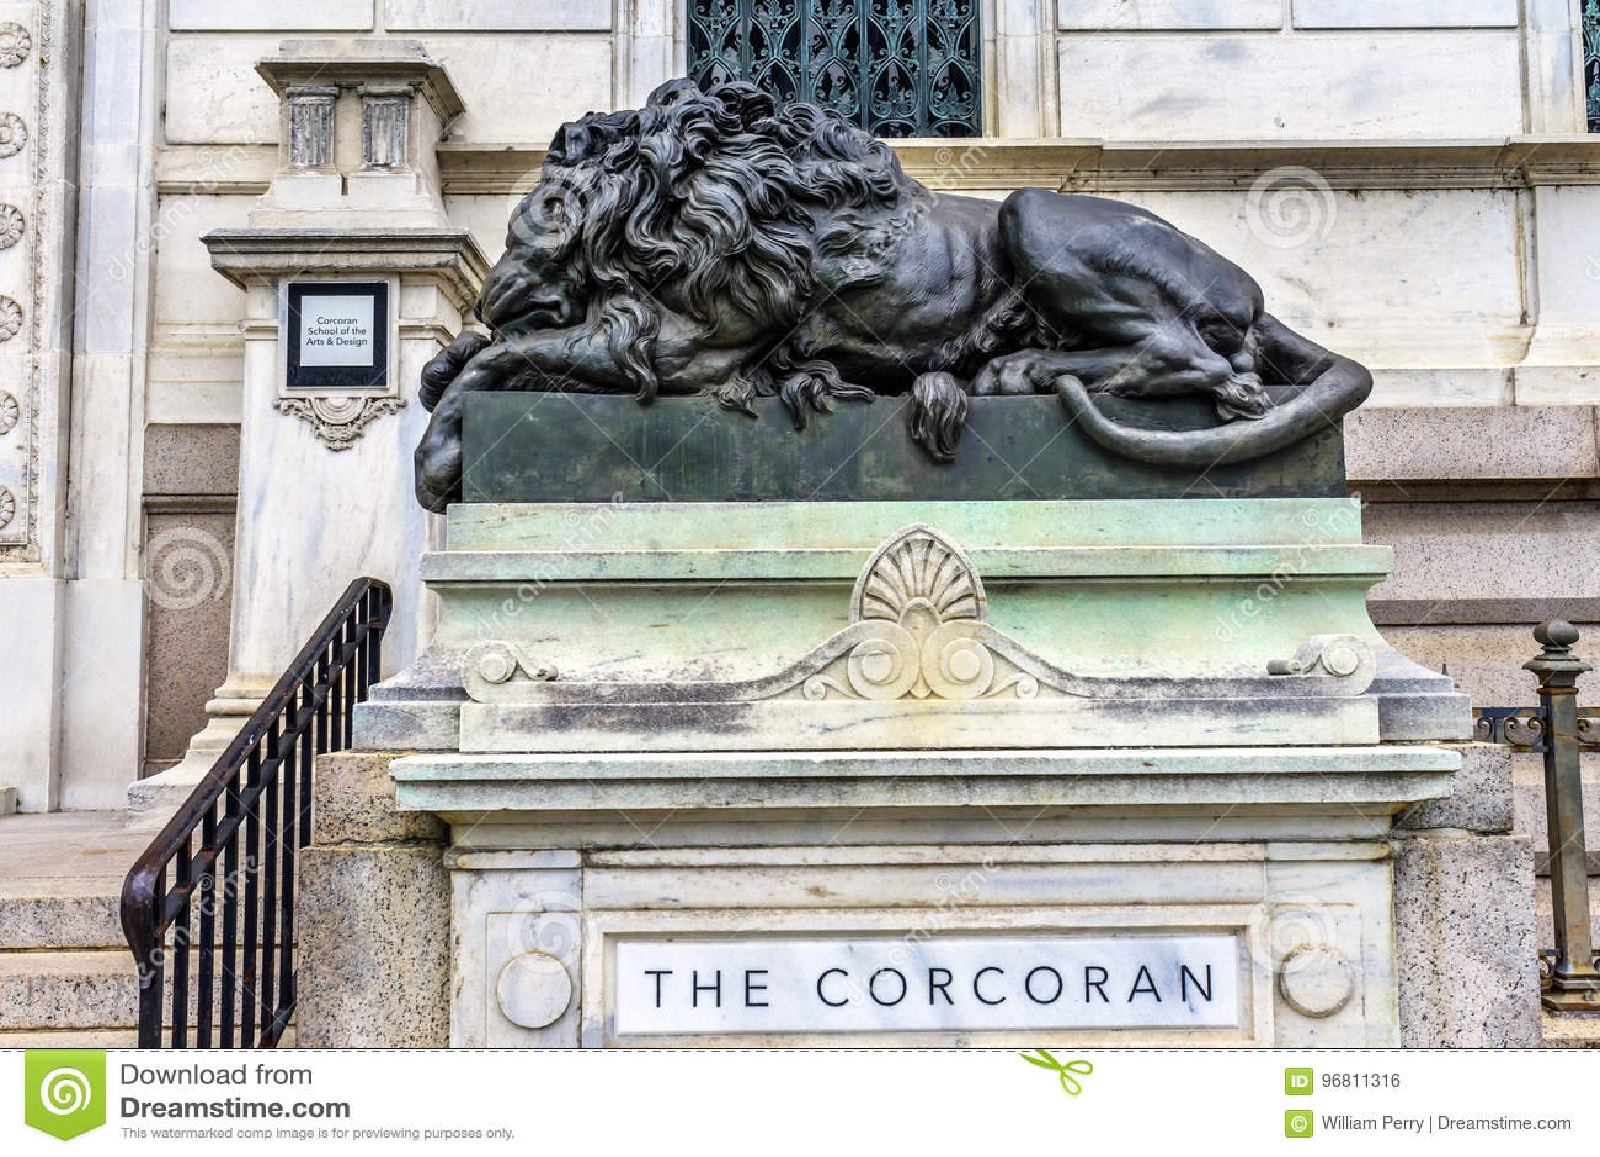 Lion Closed Cochran Gallery triste da C.C. de Art Washington